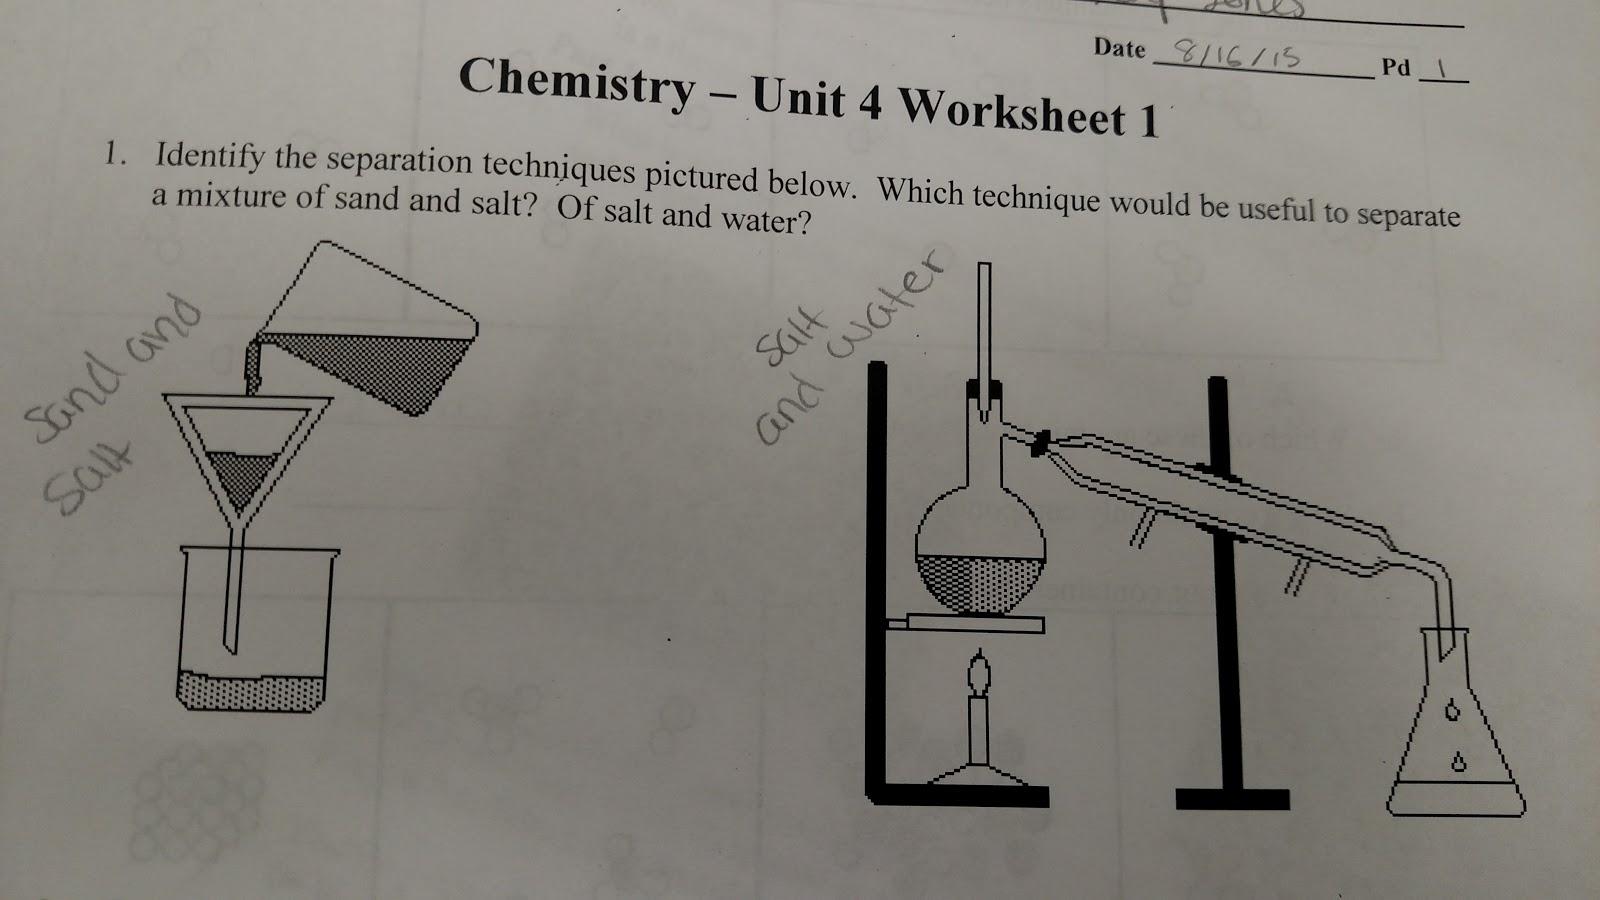 chemistry unit 4 worksheet 1 The Worst Advices We've Heard - Grad ...